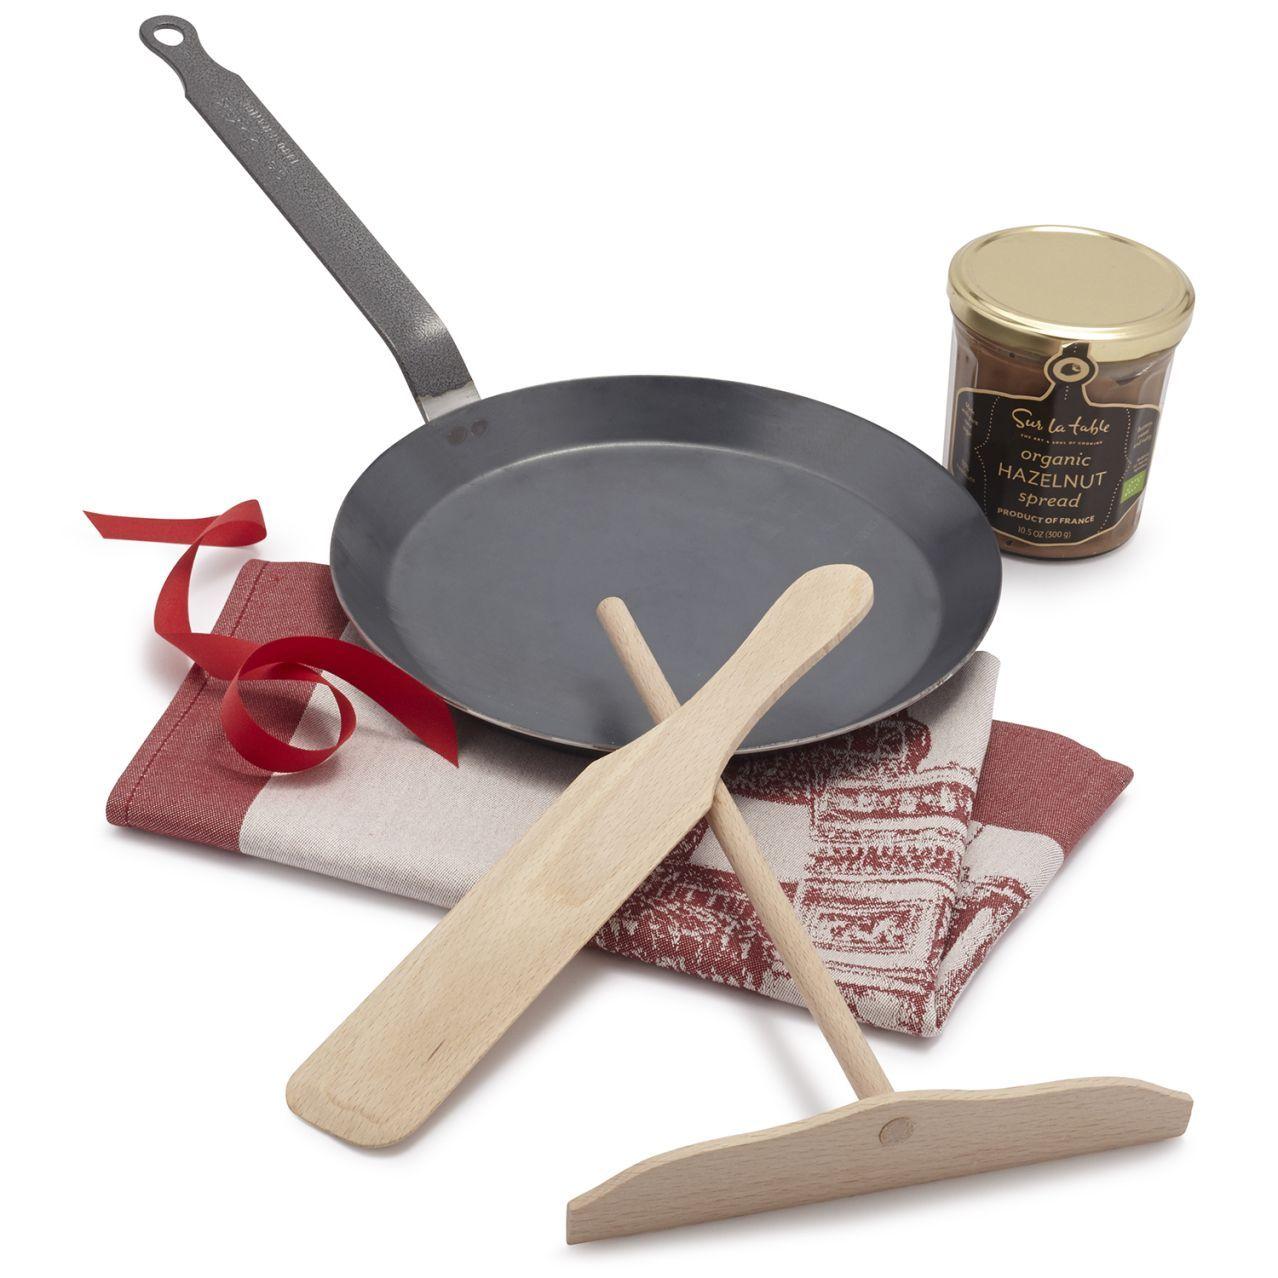 Elegant Crêpe Gift Set | Sur La Table Also A Perfect Pan For Buckwheat.